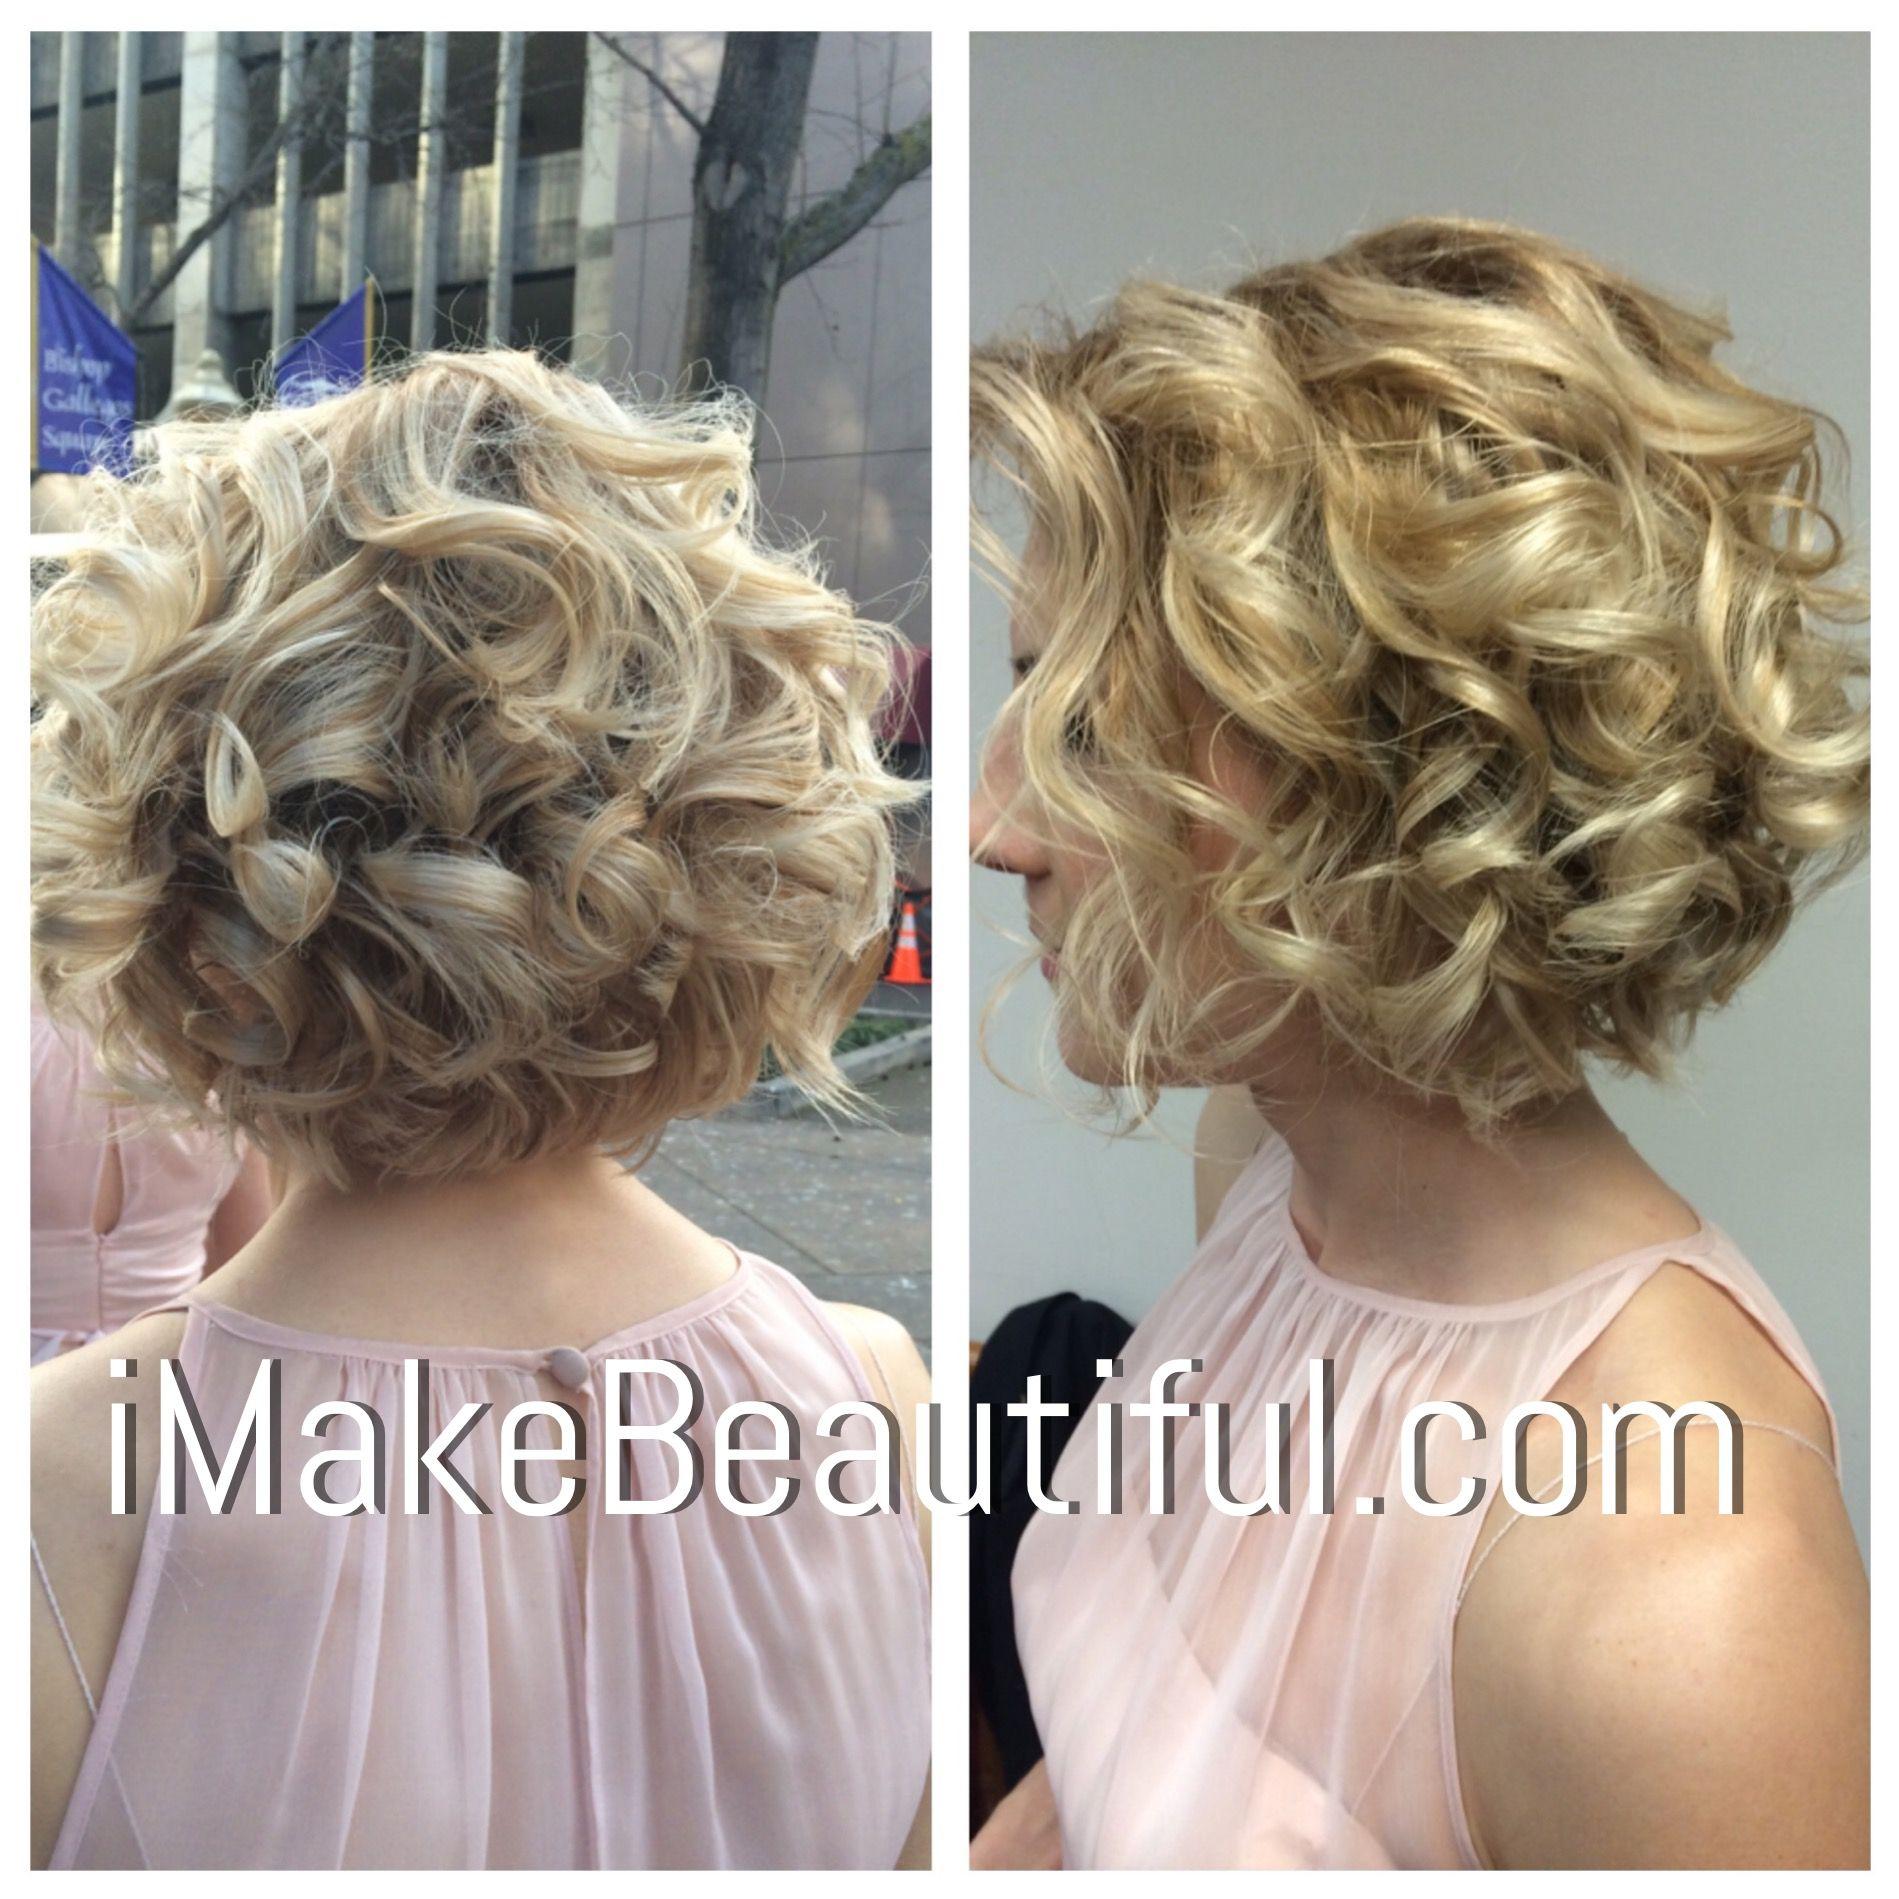 Bridal hair for short hair best hairstyles pinterest bridal